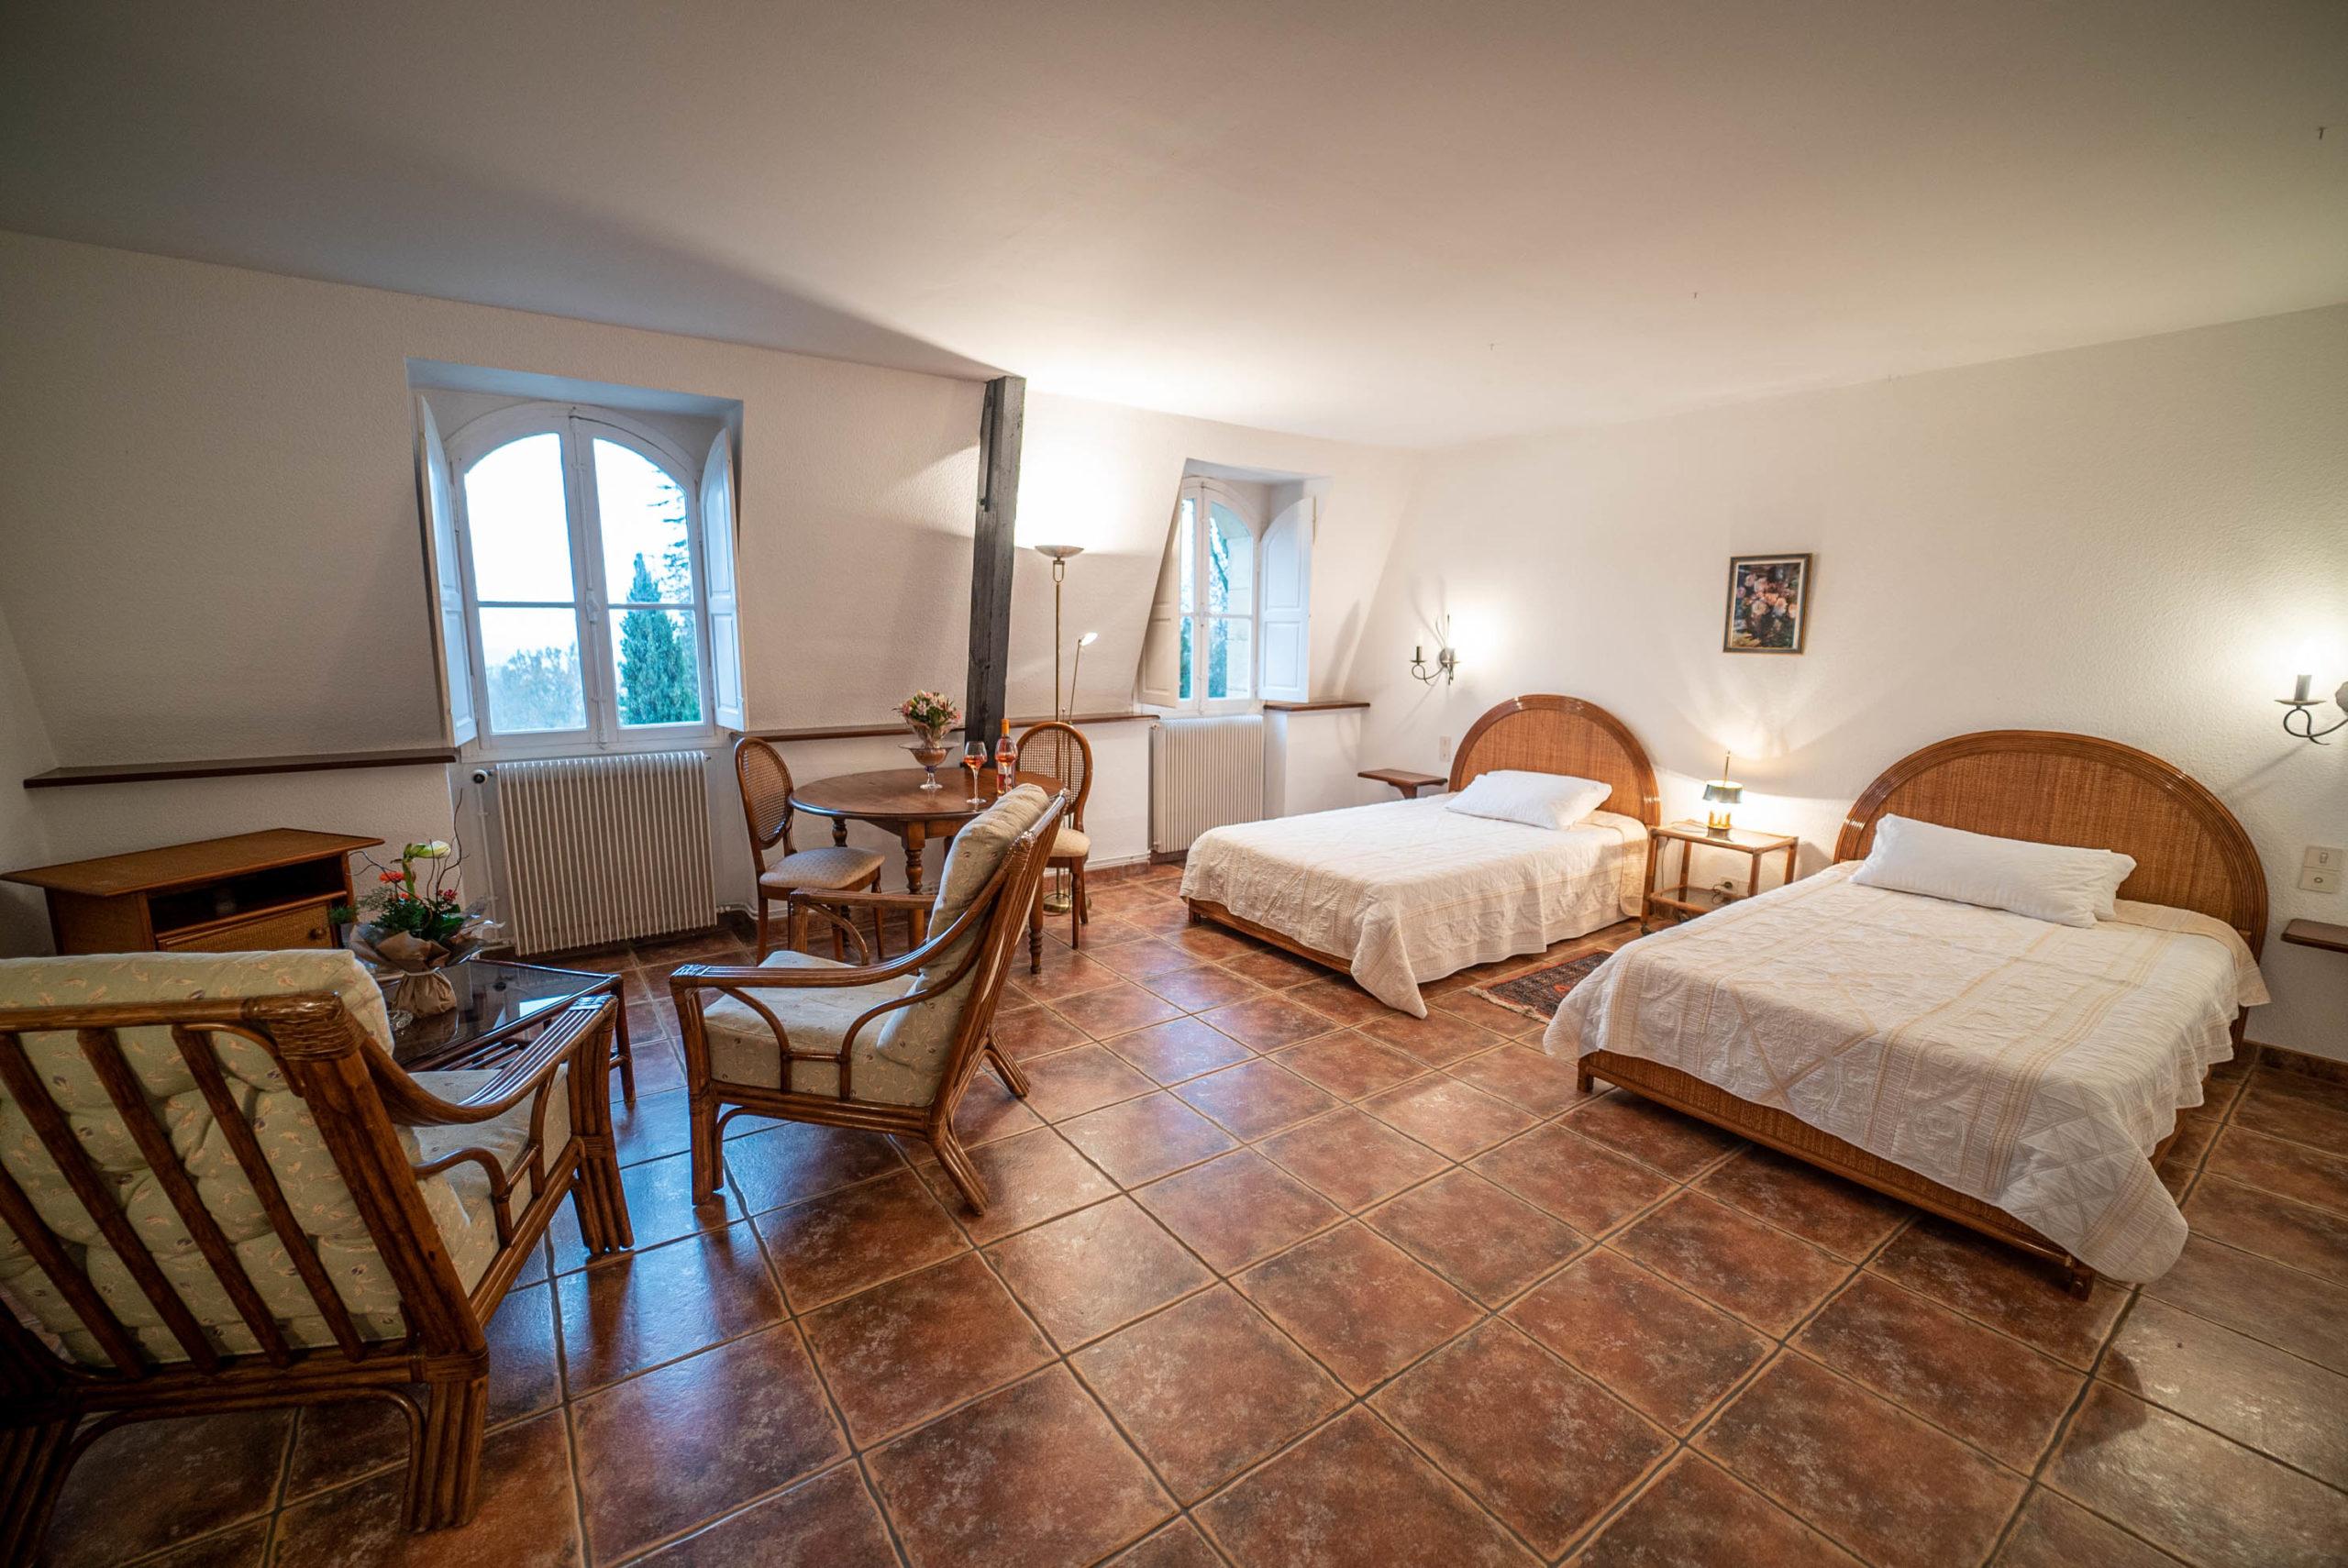 Chambre des convives chateau Rauly location bergerac Monbazillac